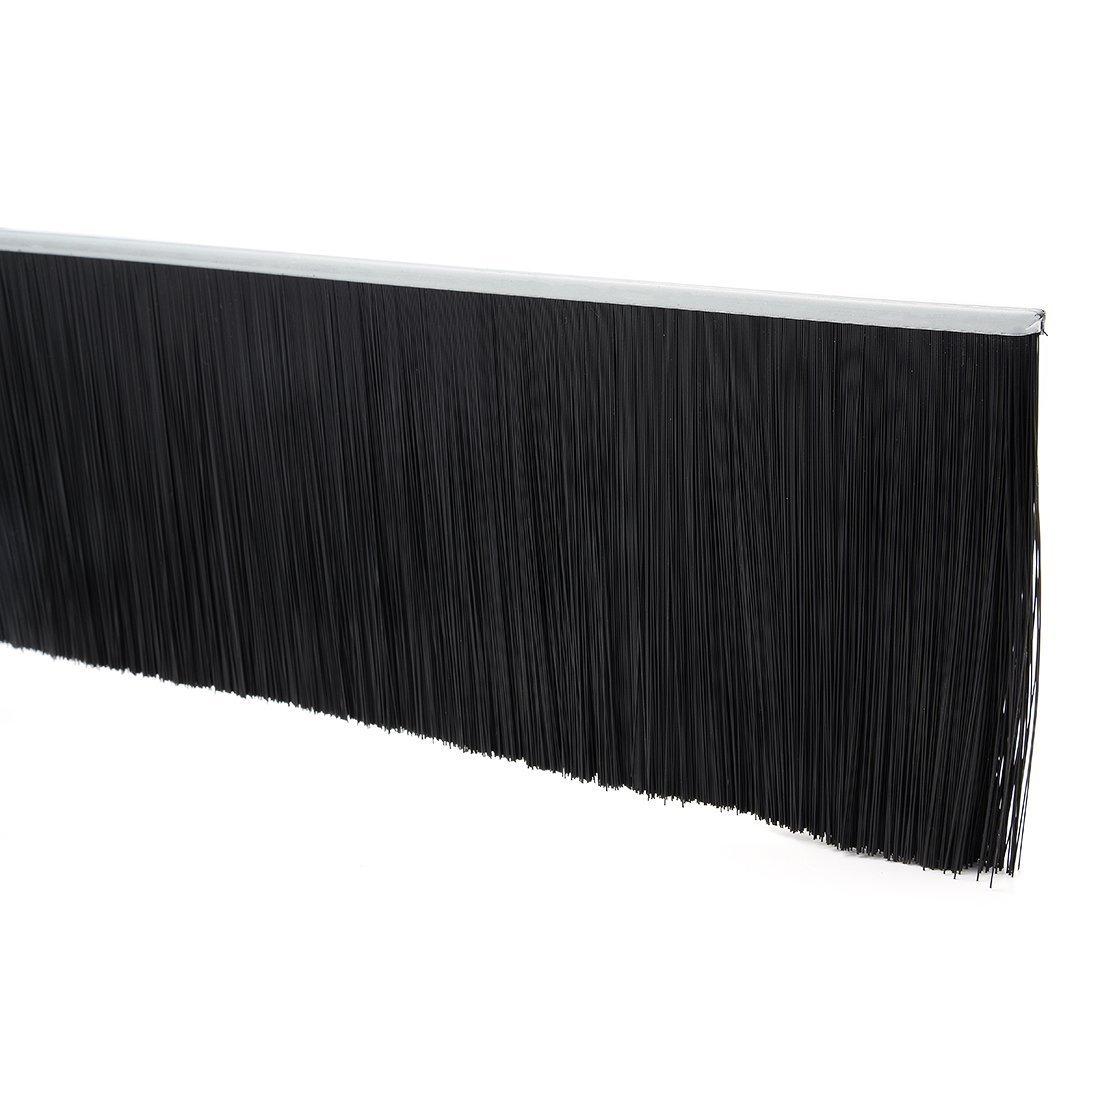 Sourcingmap 39-inch x 4.4-inch Door Bottom Sweep Nylon Brush Insert Seal Black US-SA-AJD-334820